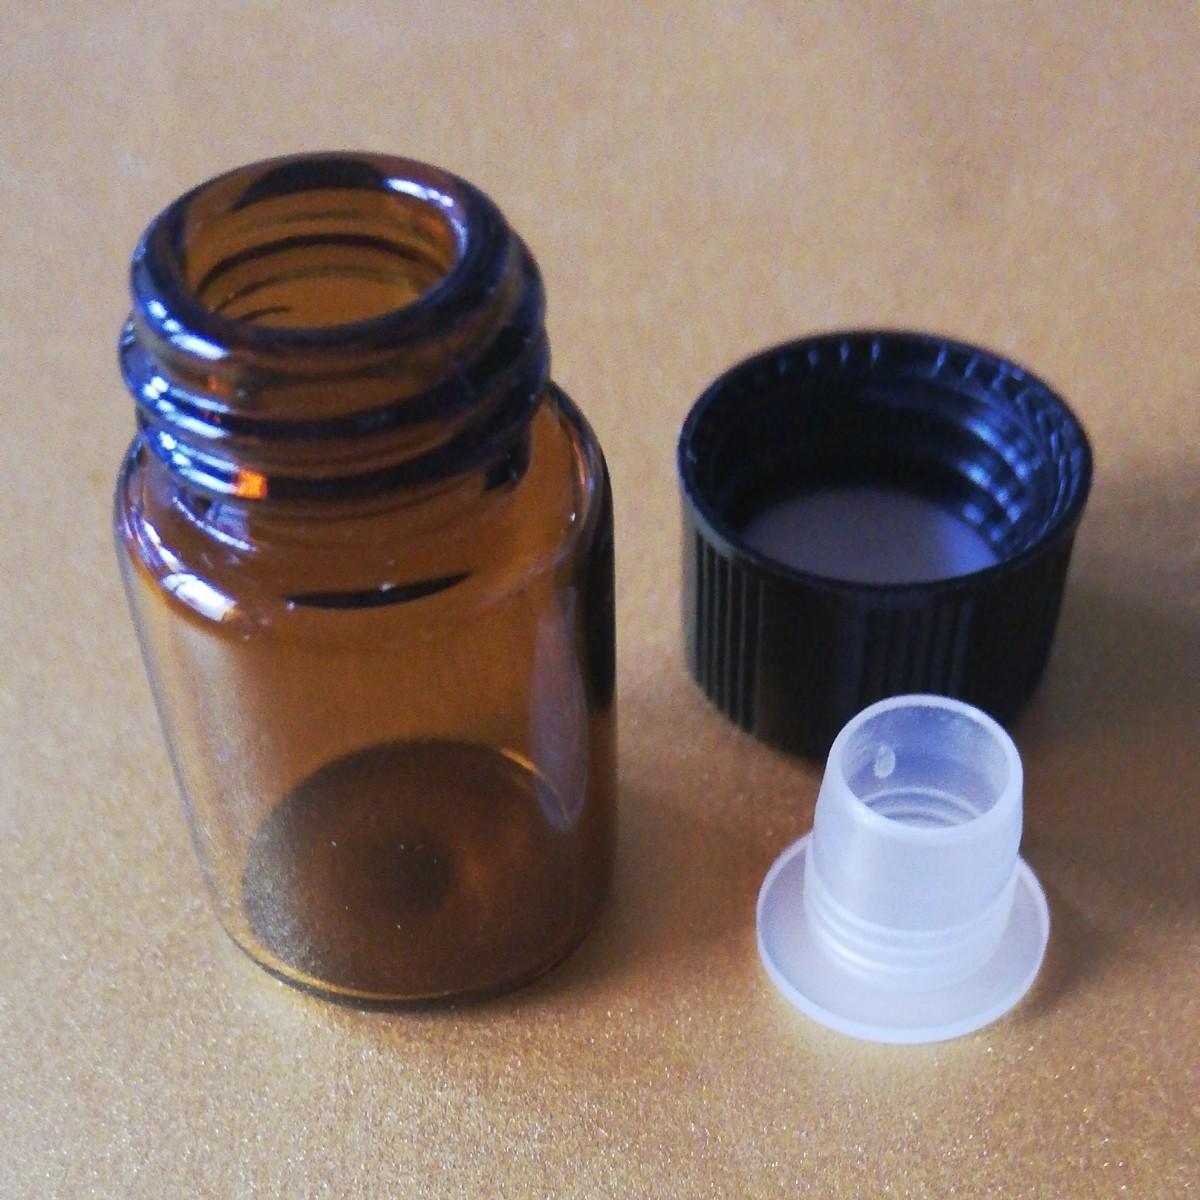 doTERRA ドテラ エッセンシャルオイル用 ミニボトル 容量2ml 未使用空き瓶 10個セット